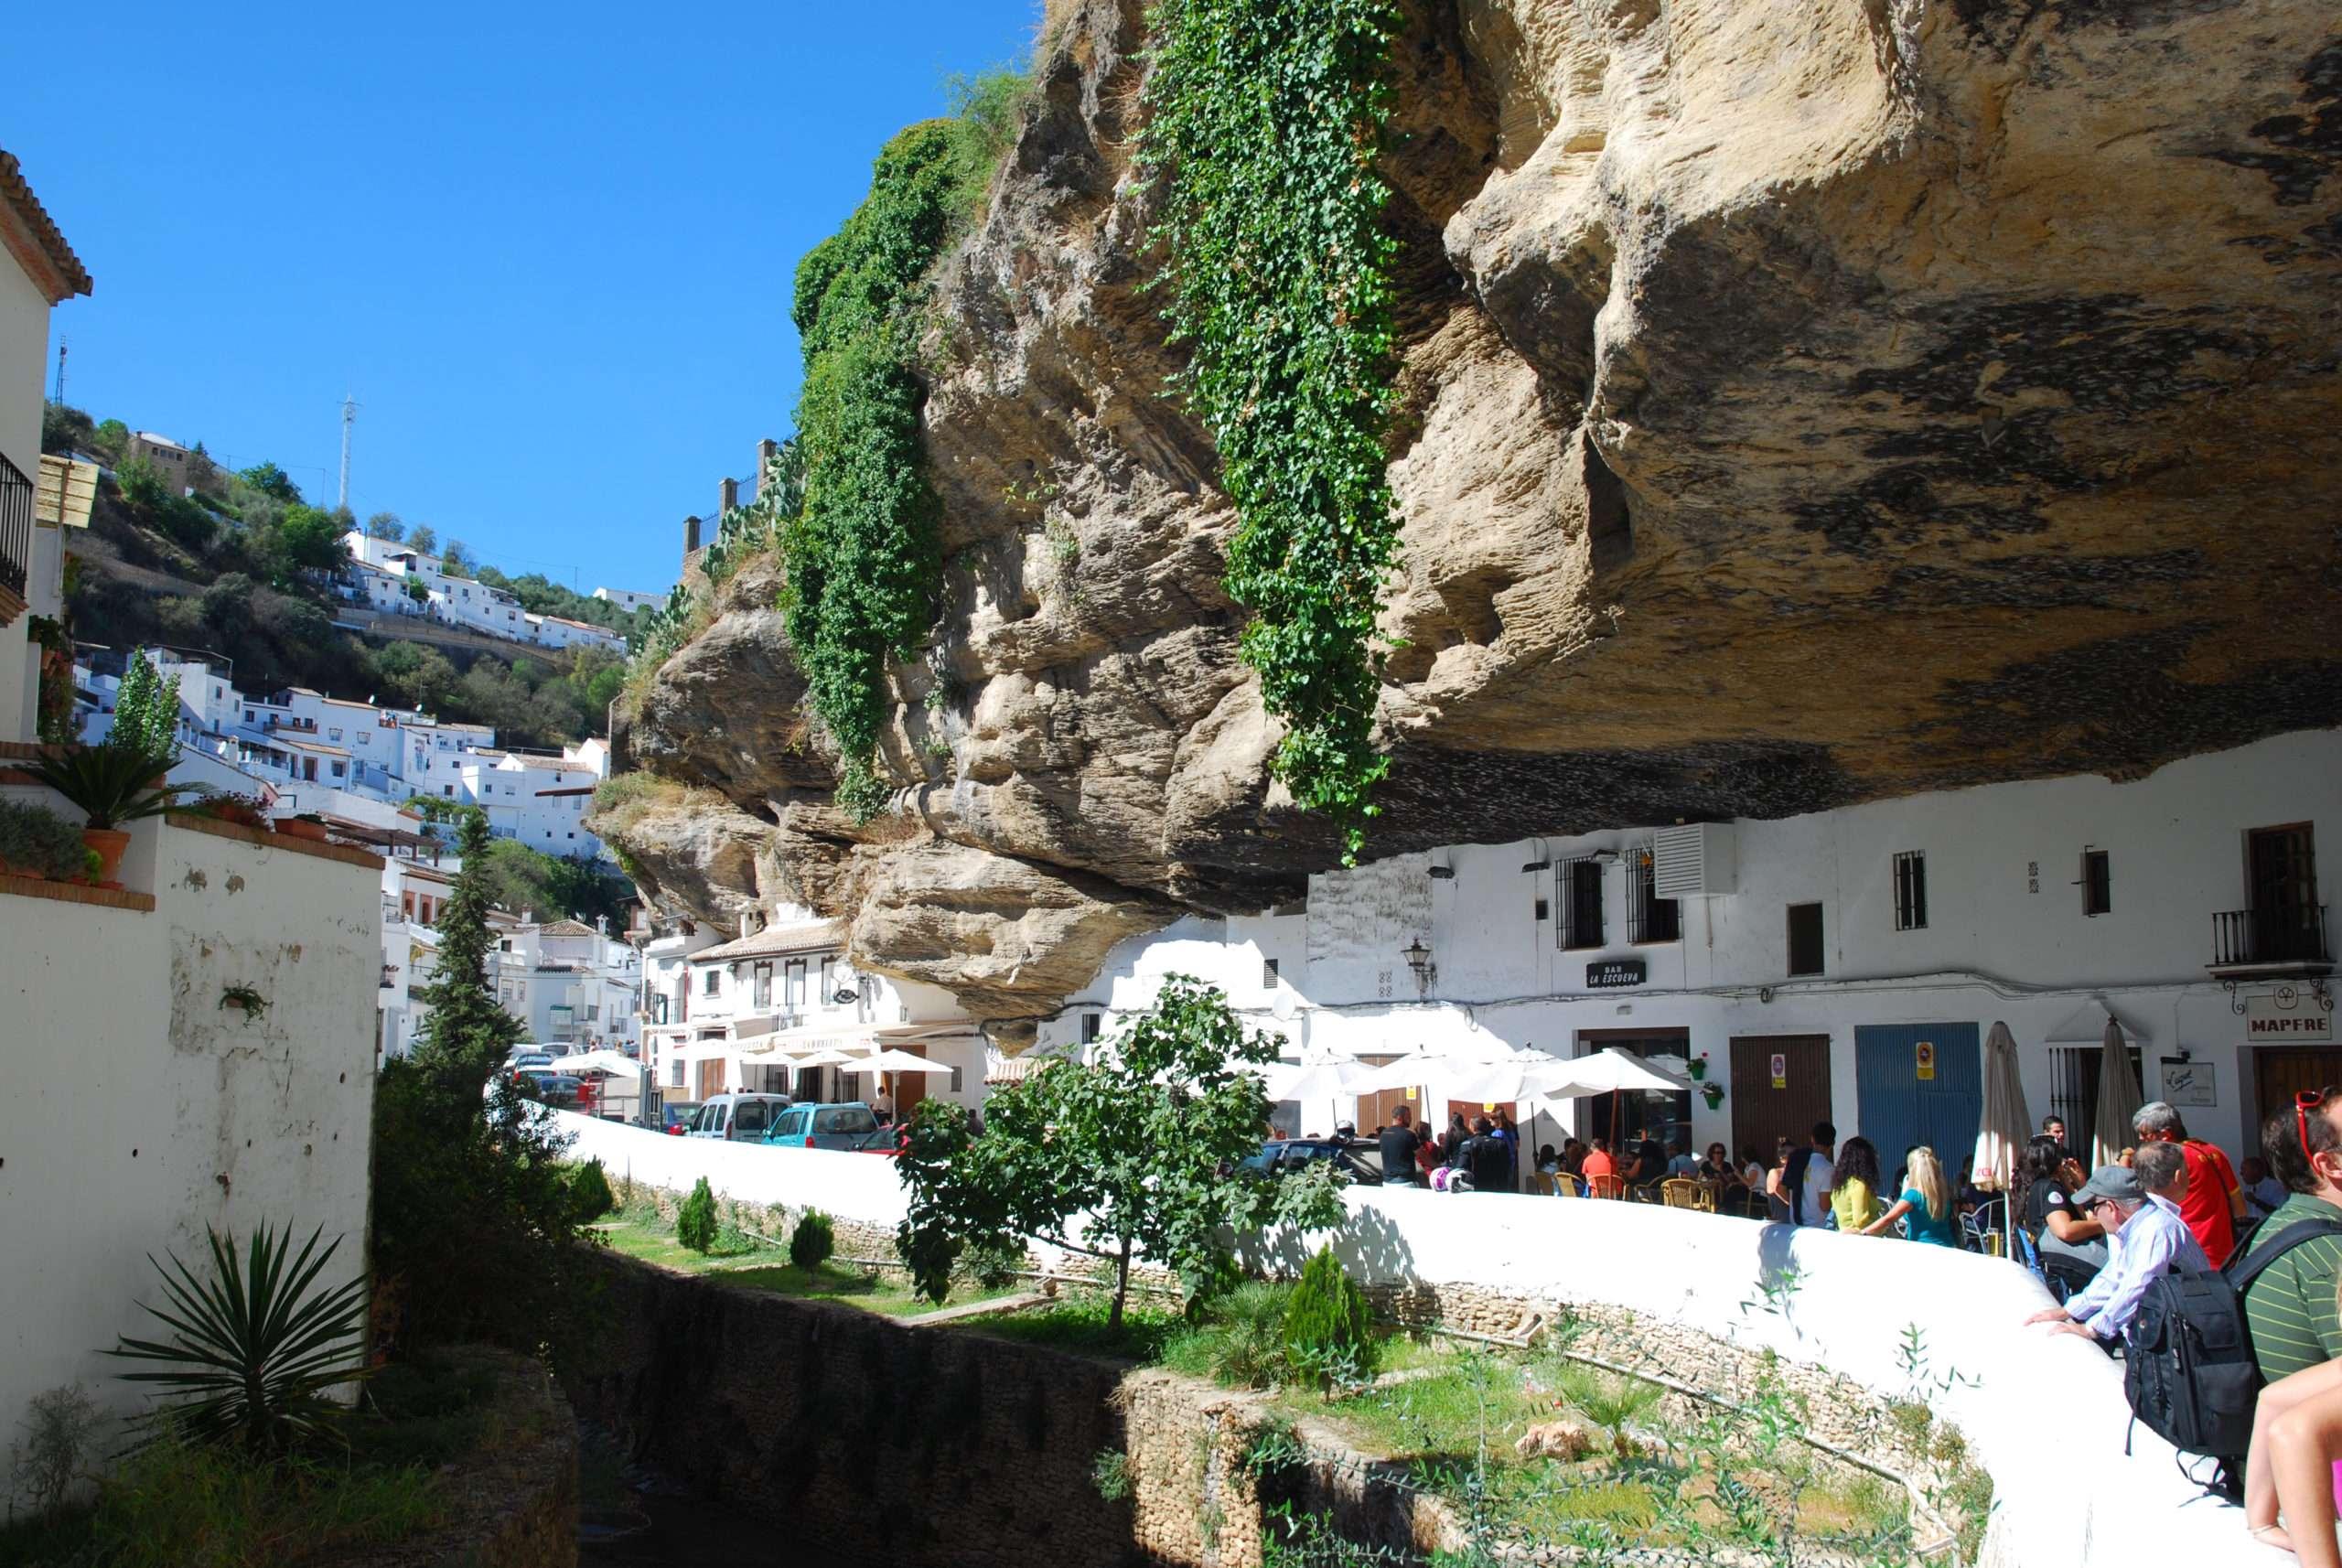 Diez rincones maravillosos de andaluc a tourse viajes - El mundo andalucia malaga ...